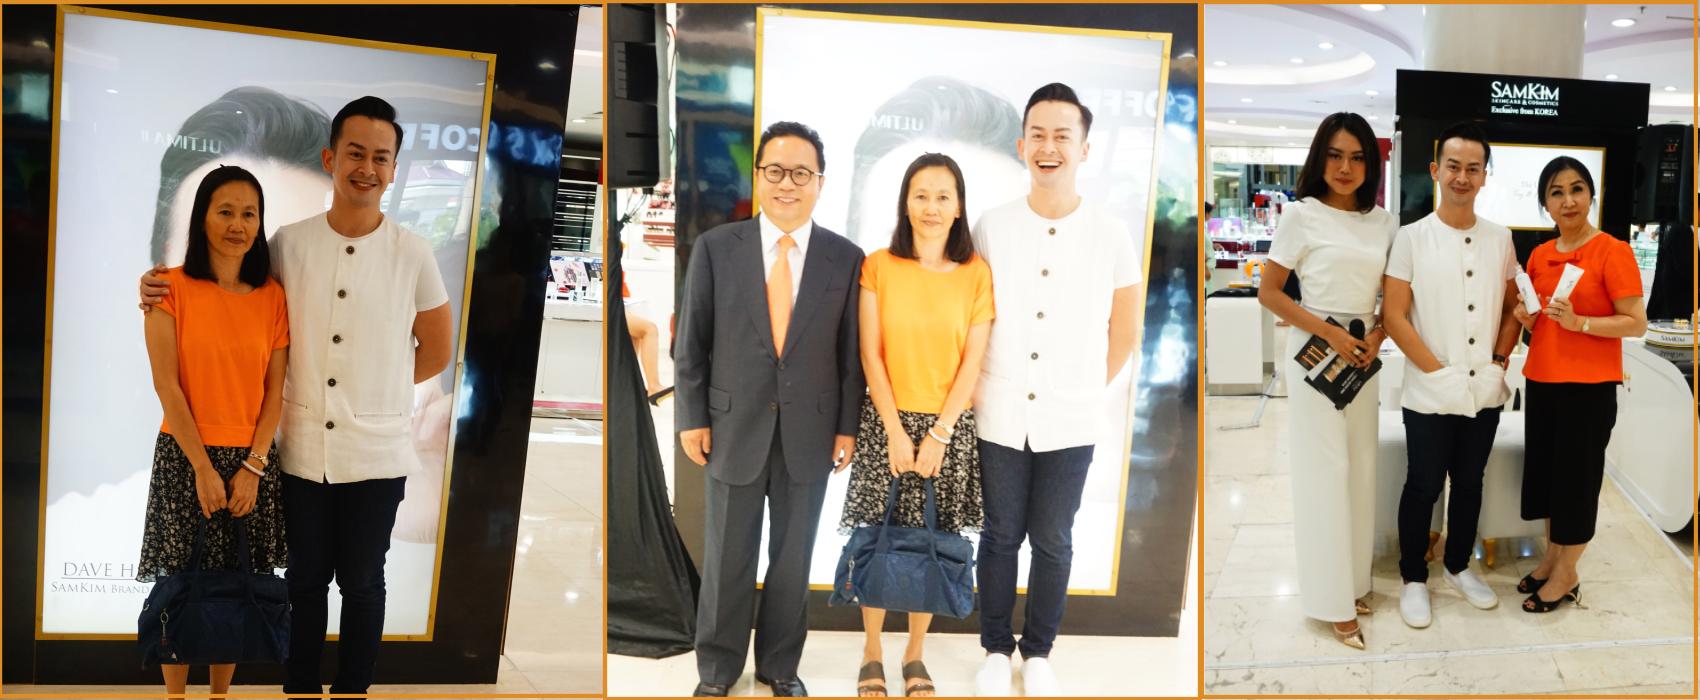 Meet & Greet Dave Surabaya 15 Mei 2016 3